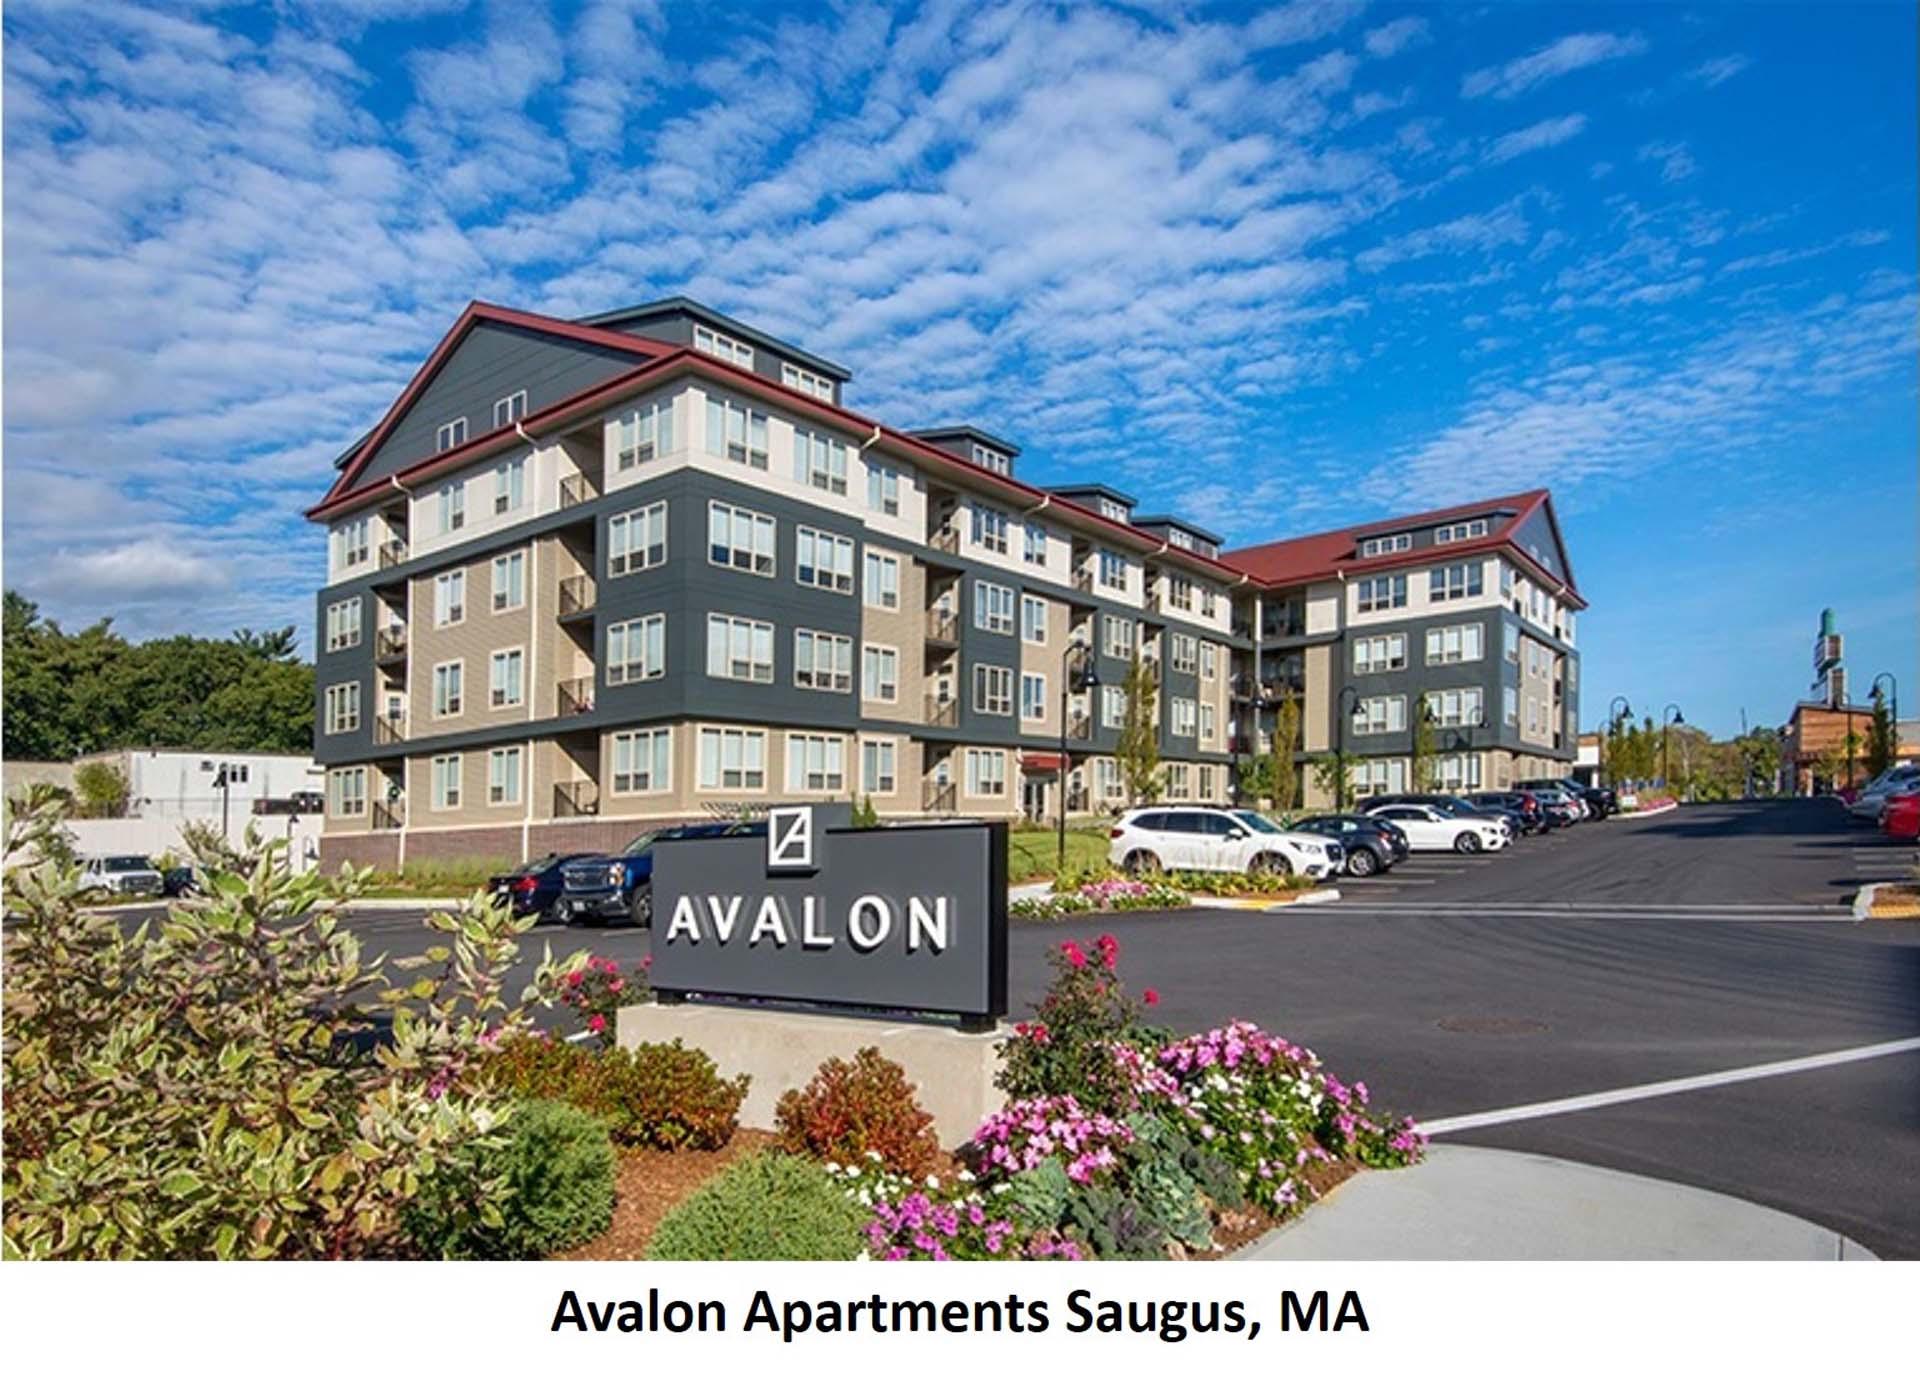 Avalon Apartments Saugus MA